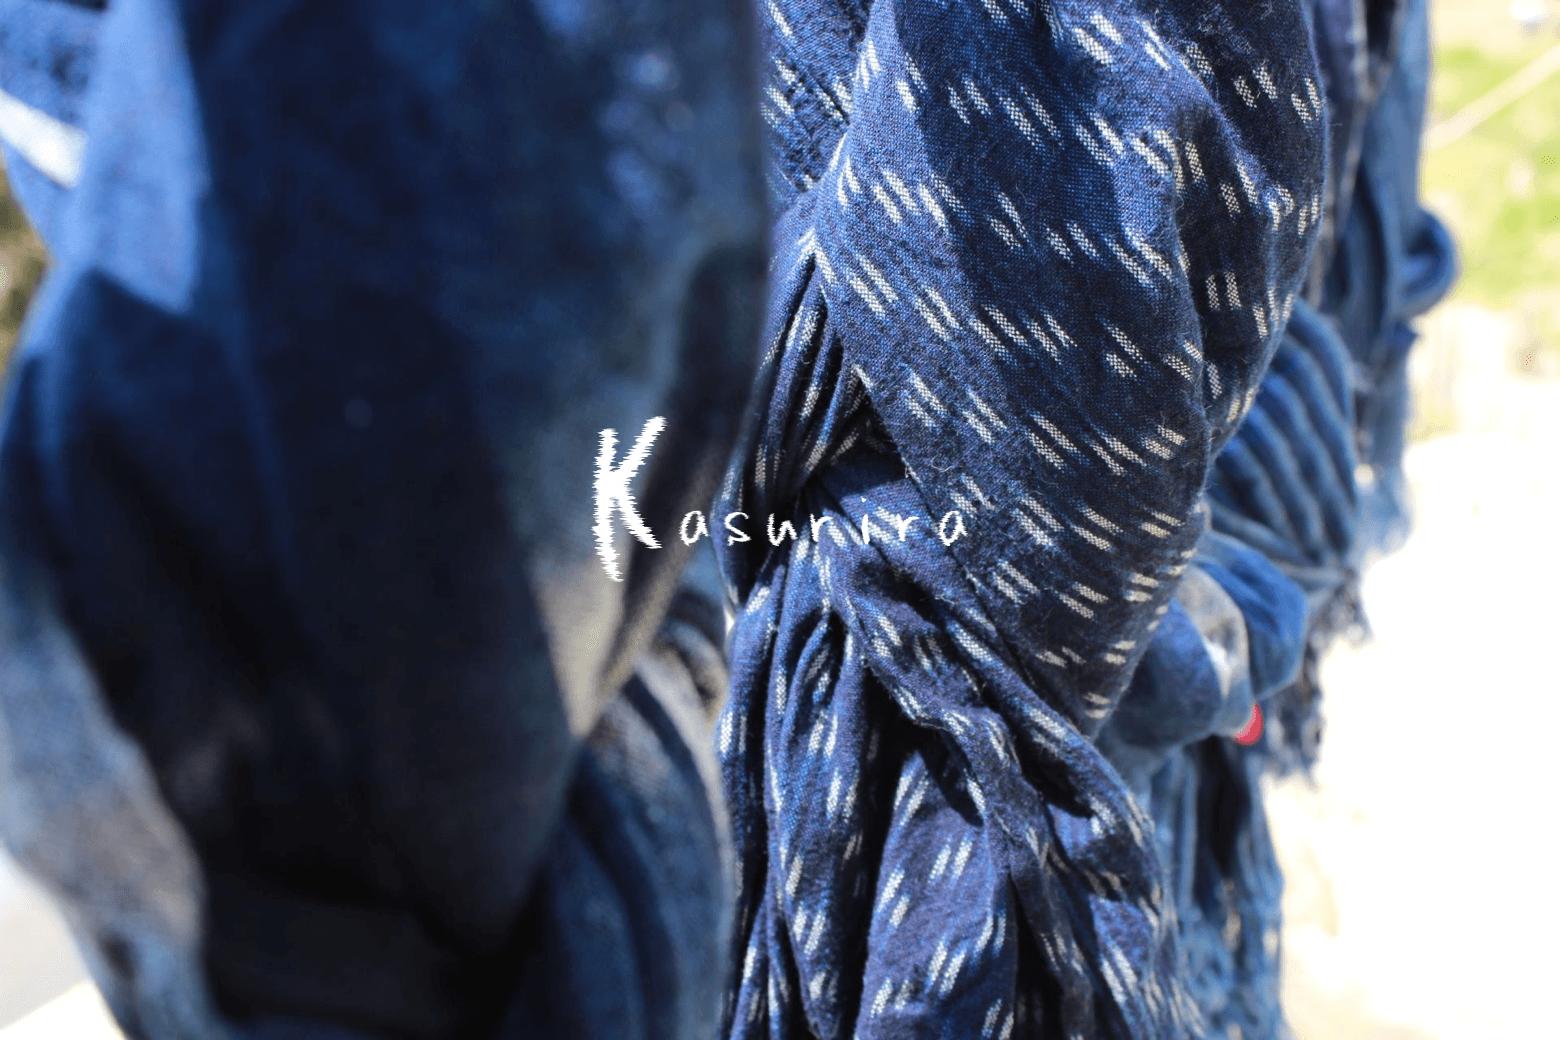 Kasurira紹介画像1